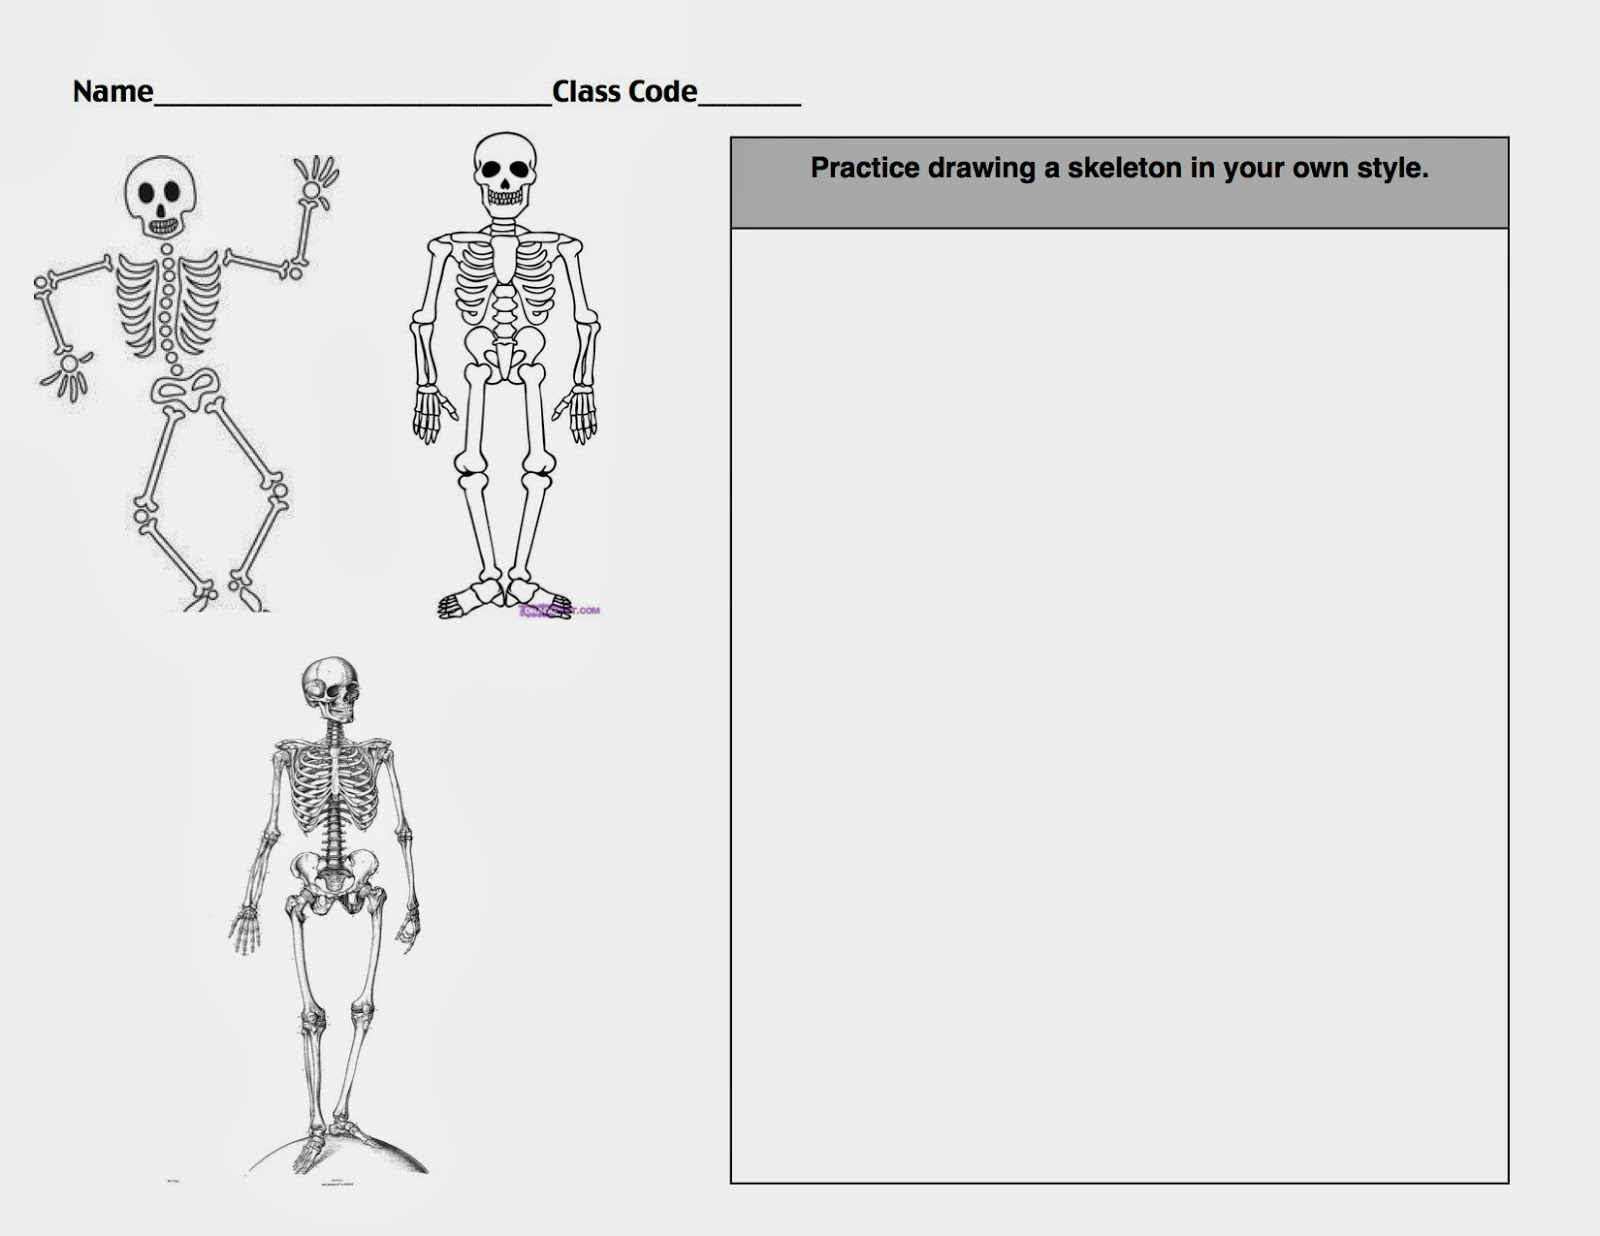 Build A Skeleton Worksheet   Printable Worksheets and Activities for  Teachers [ 1236 x 1600 Pixel ]